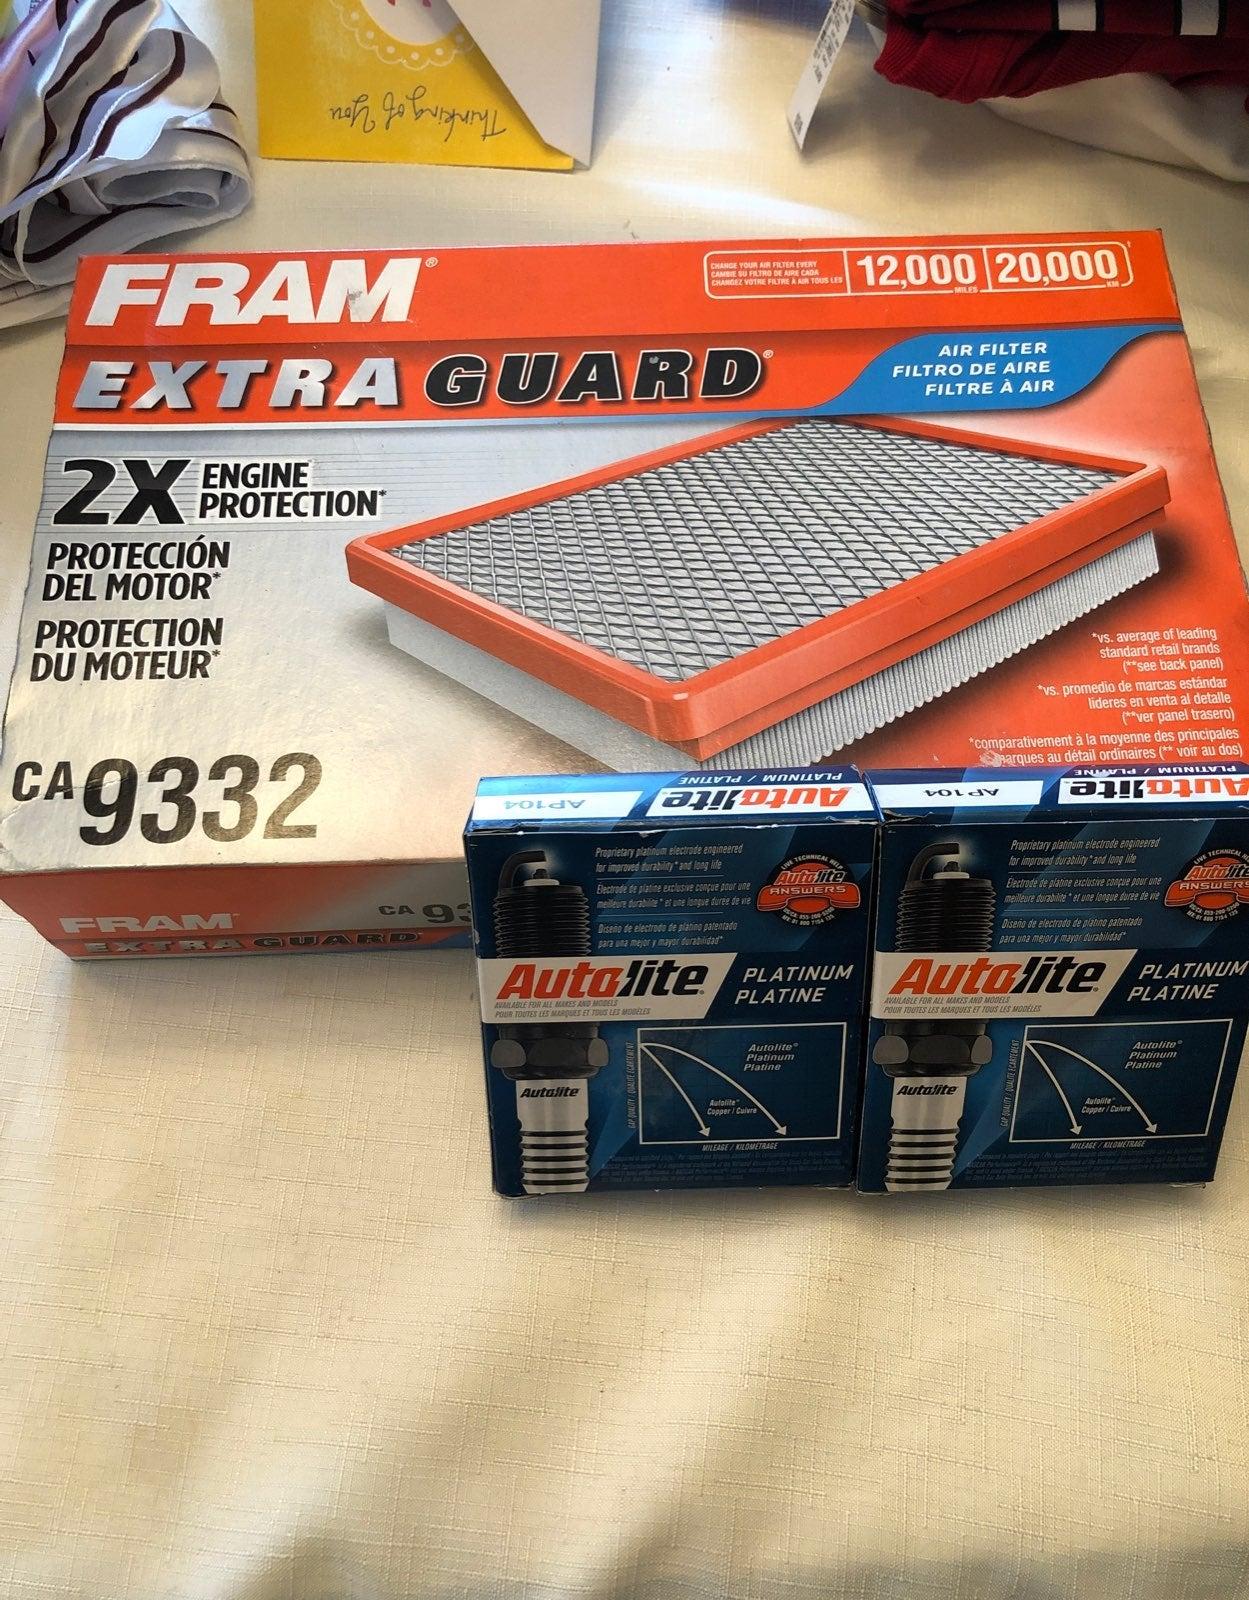 Car parts - spark plugs & Fram filter